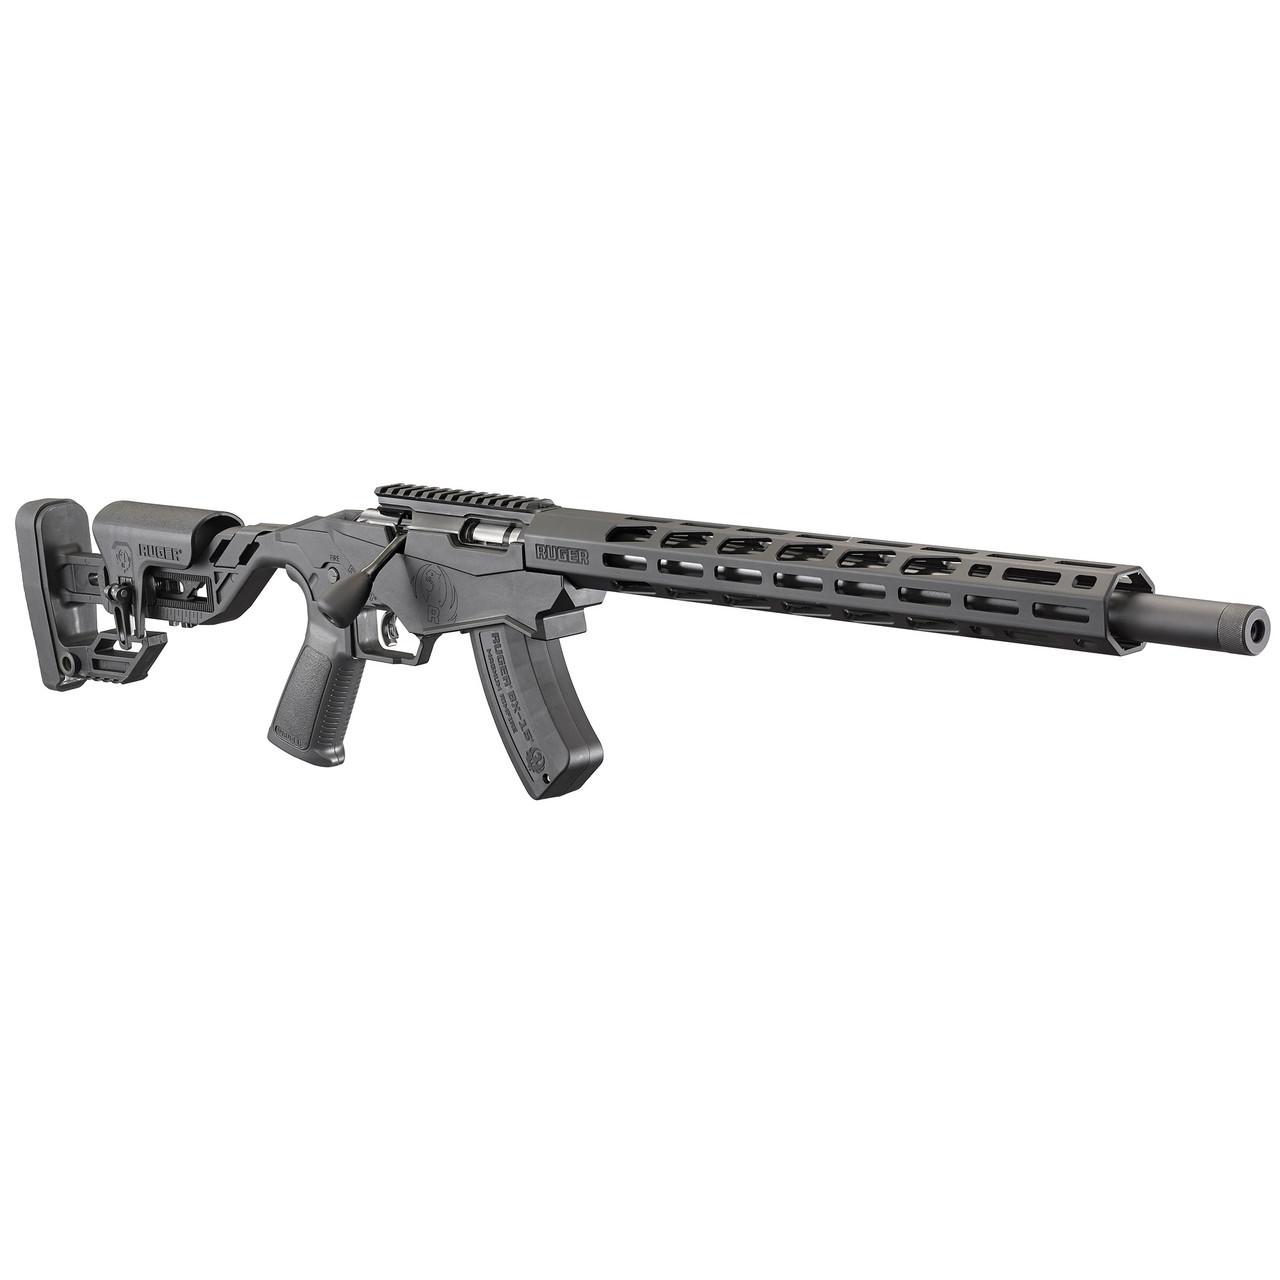 Ruger Precision Rimfire Rifle CALIFORNIA LEGAL - .17 HMR